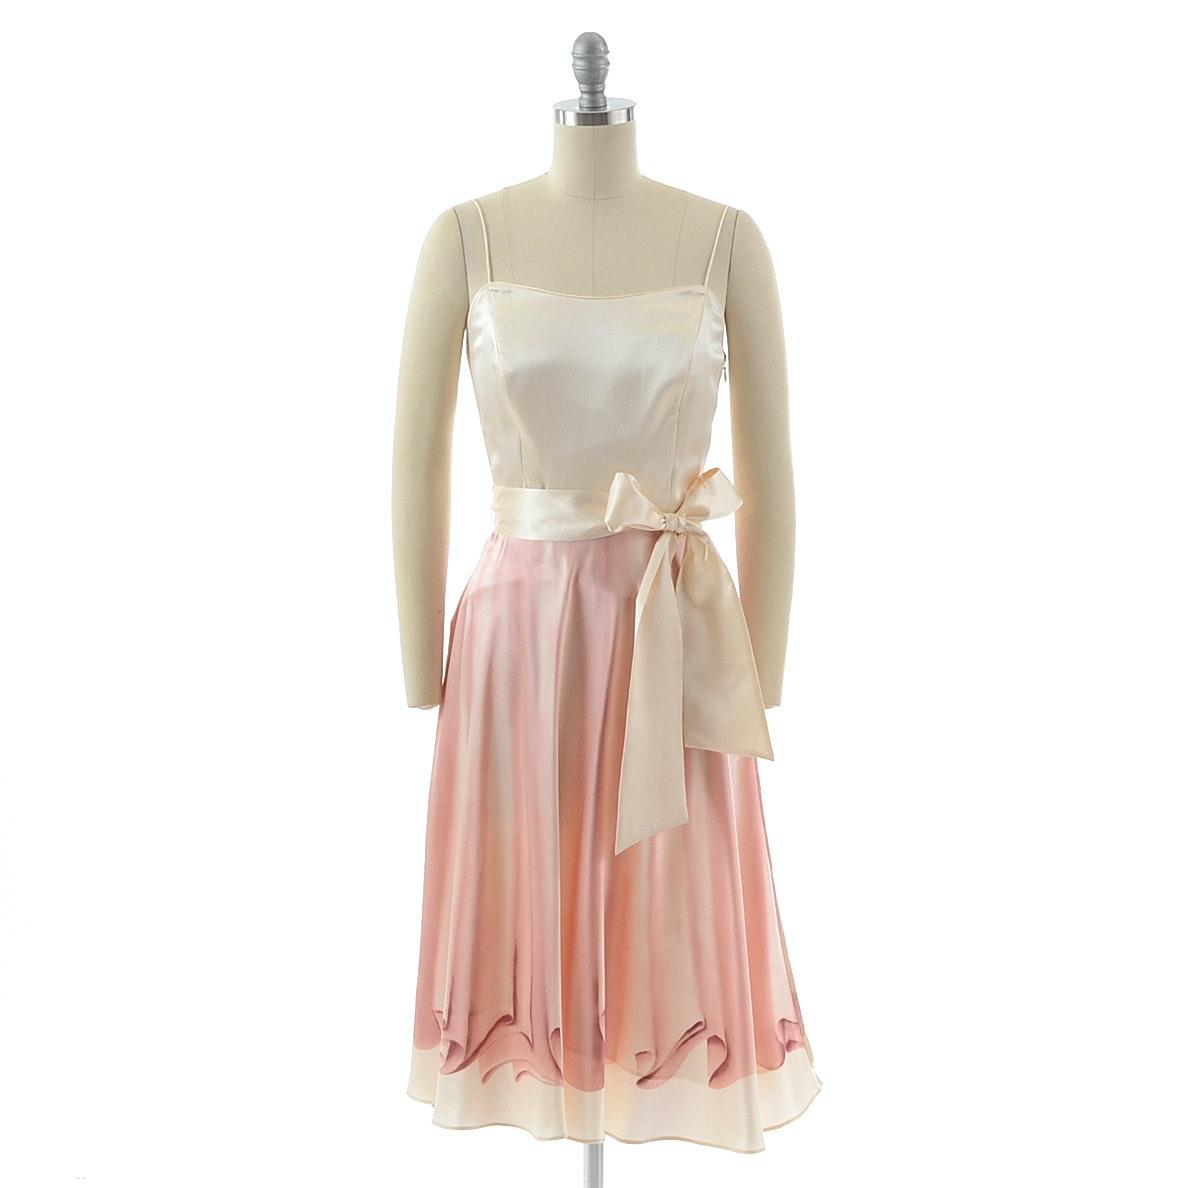 Susan Lucci Brand Silk Trompe-l'œil Dress